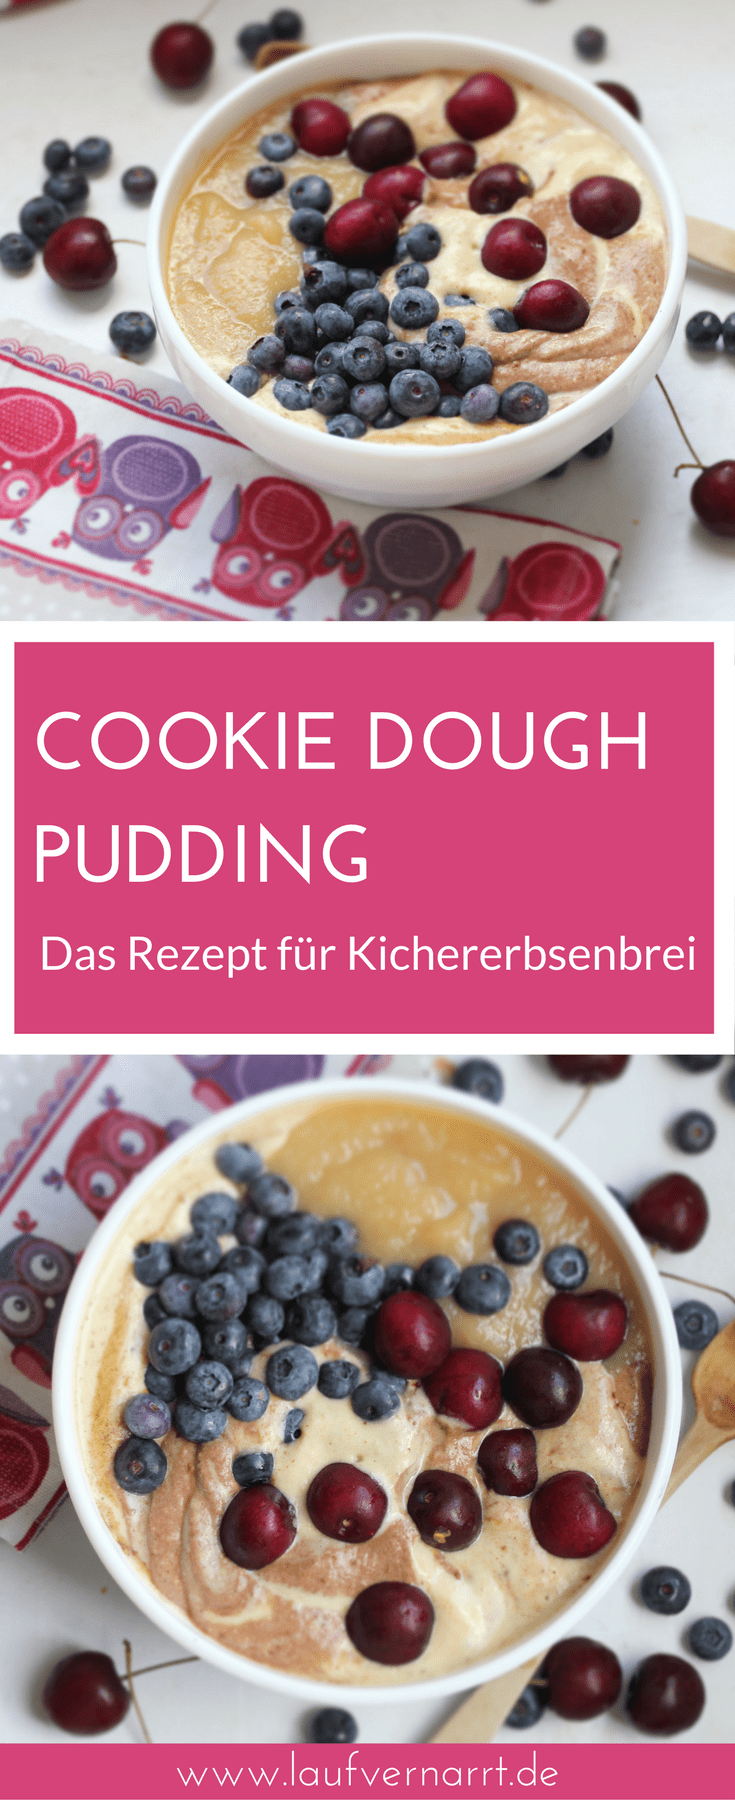 Photo of Cookie dough pudding – sweet chickpea porridge – fond of running